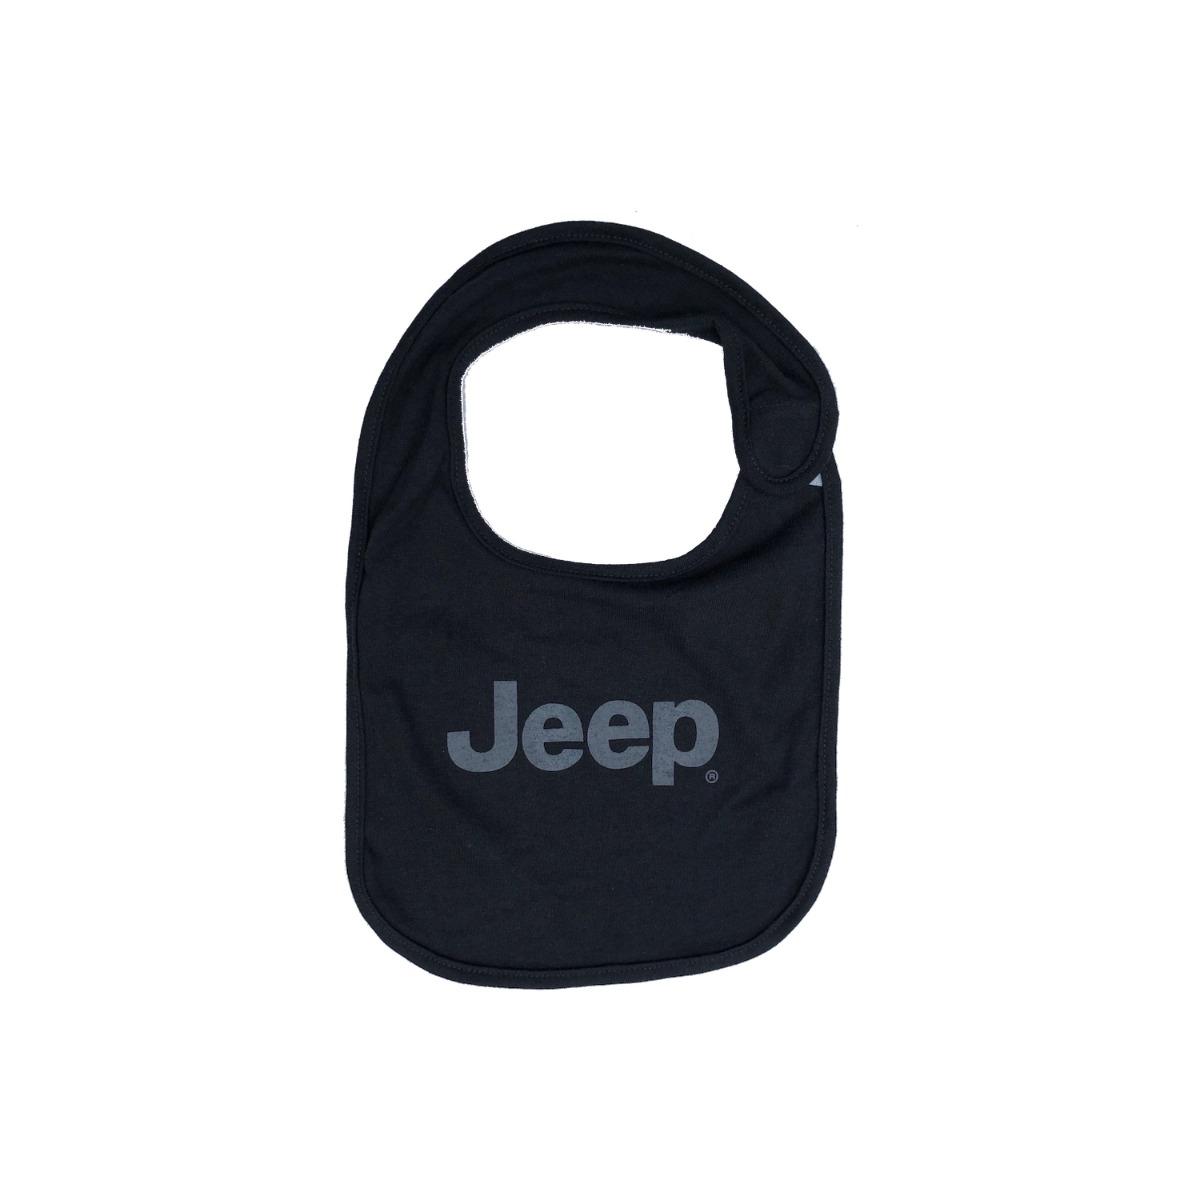 Jeep Baby Bib